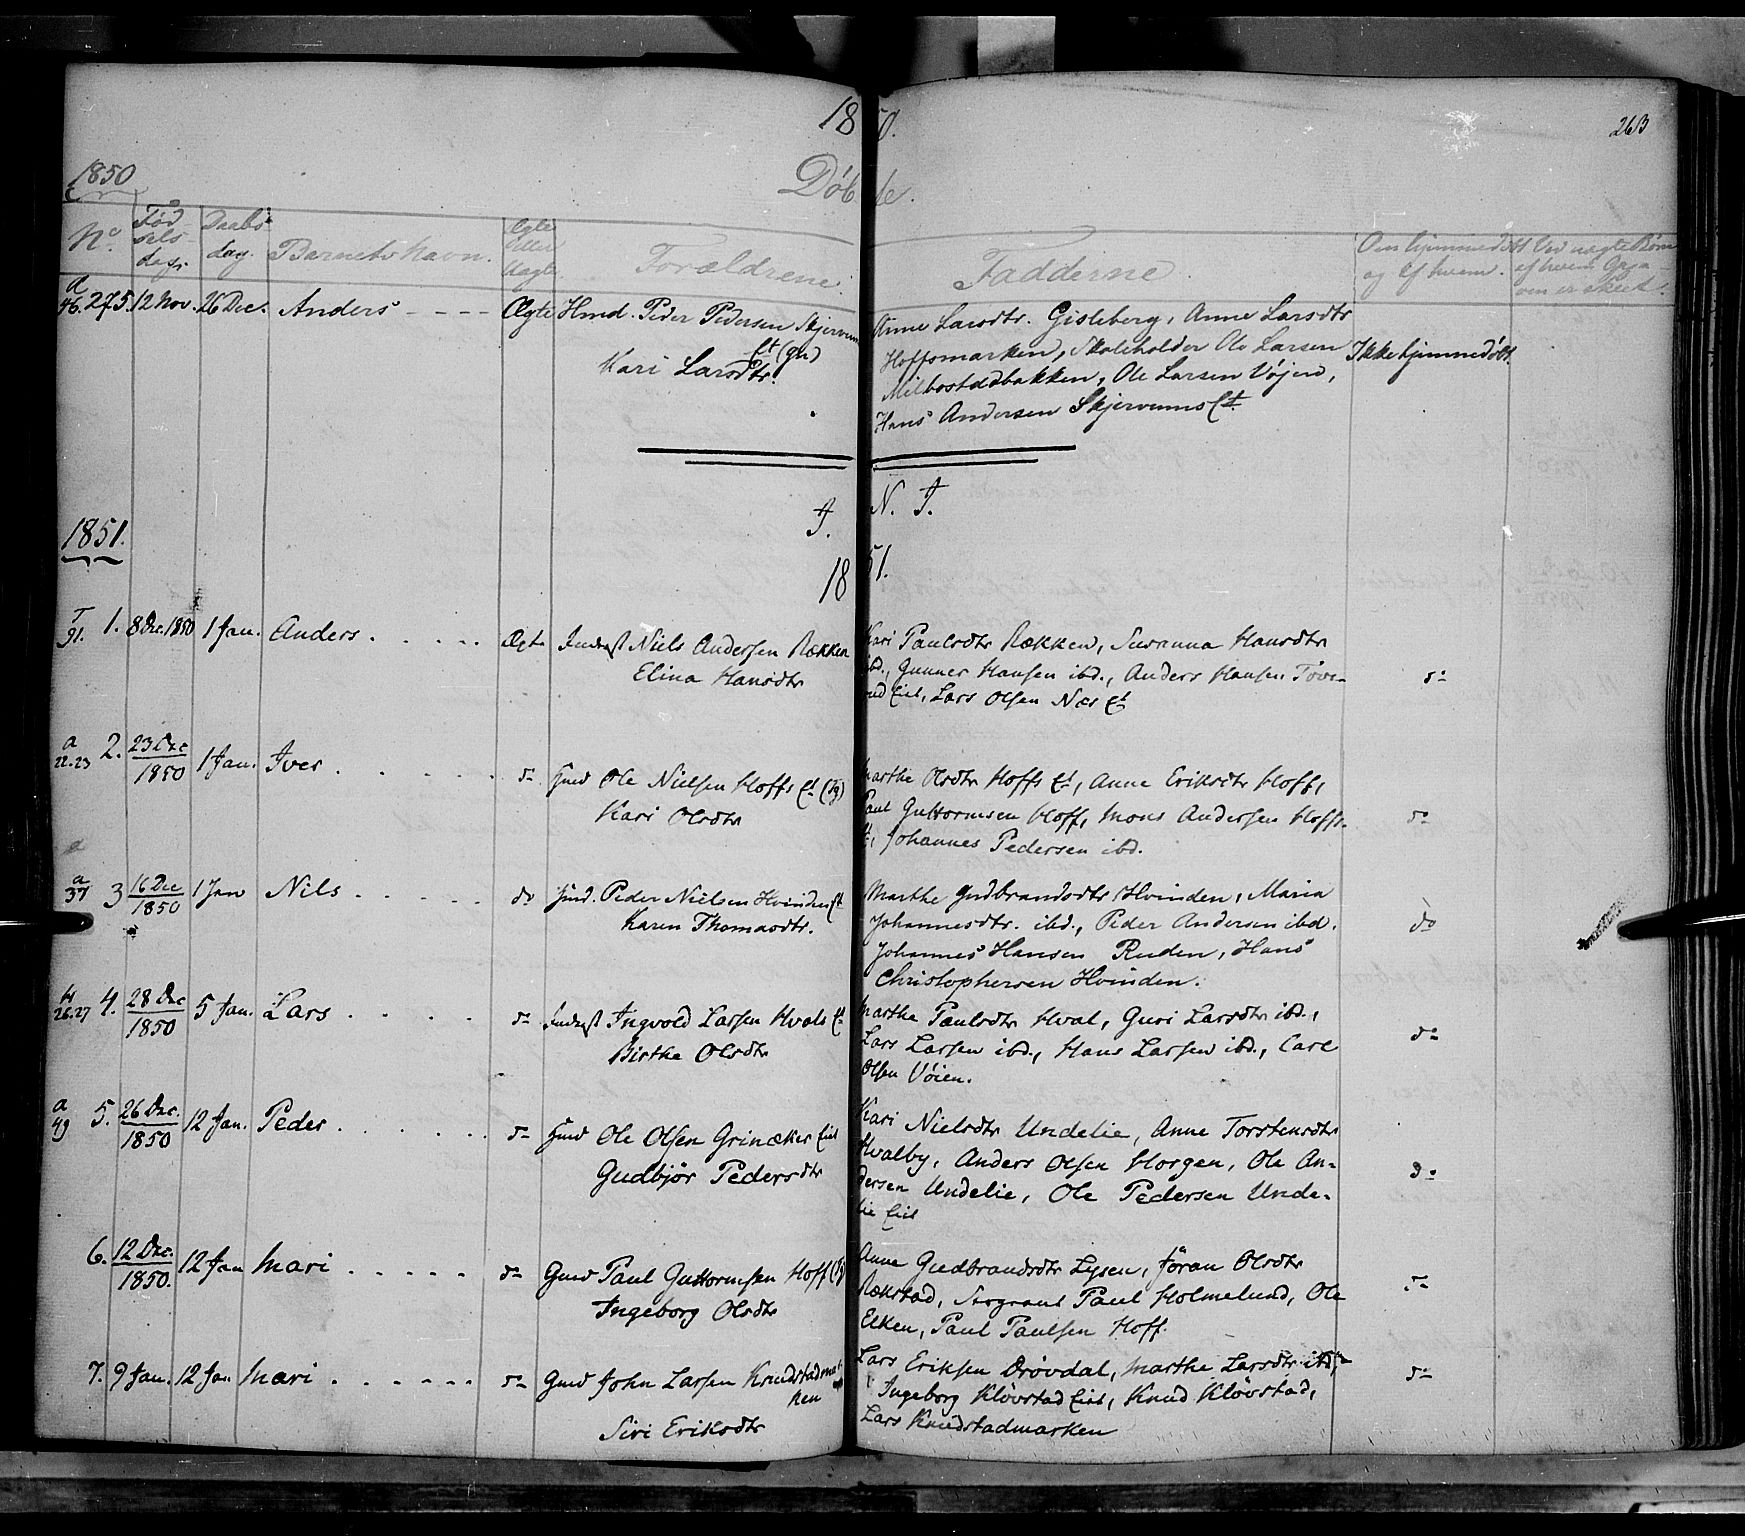 SAH, Gran prestekontor, Ministerialbok nr. 11, 1842-1856, s. 262-263